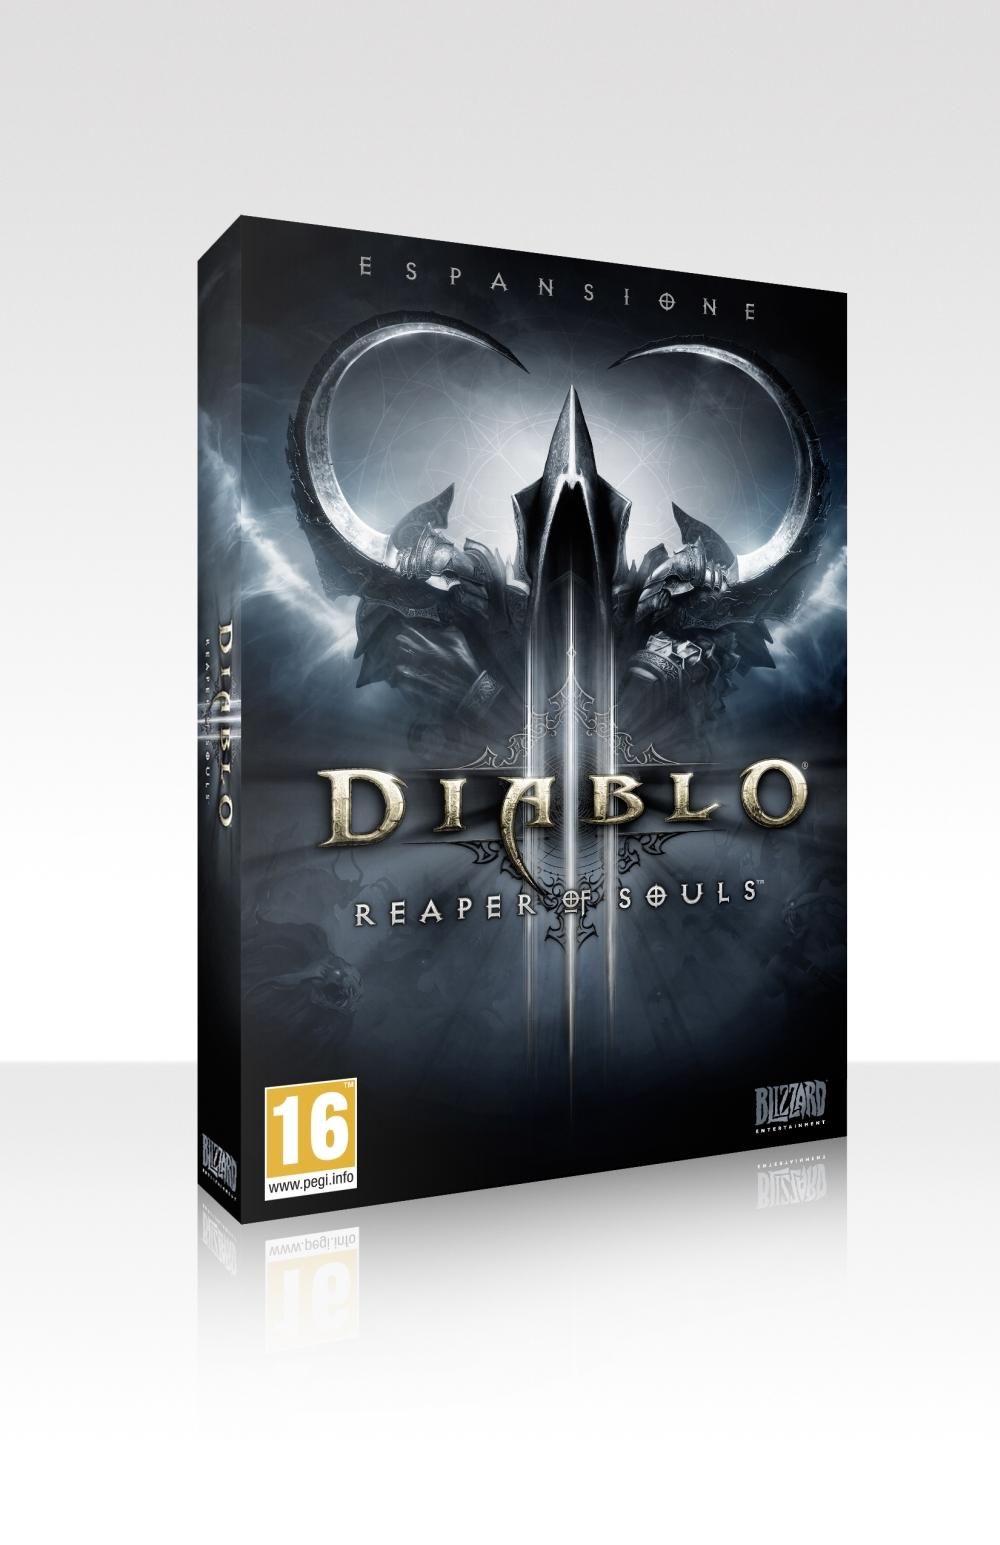 Diablo III Reaper of Souls Pack